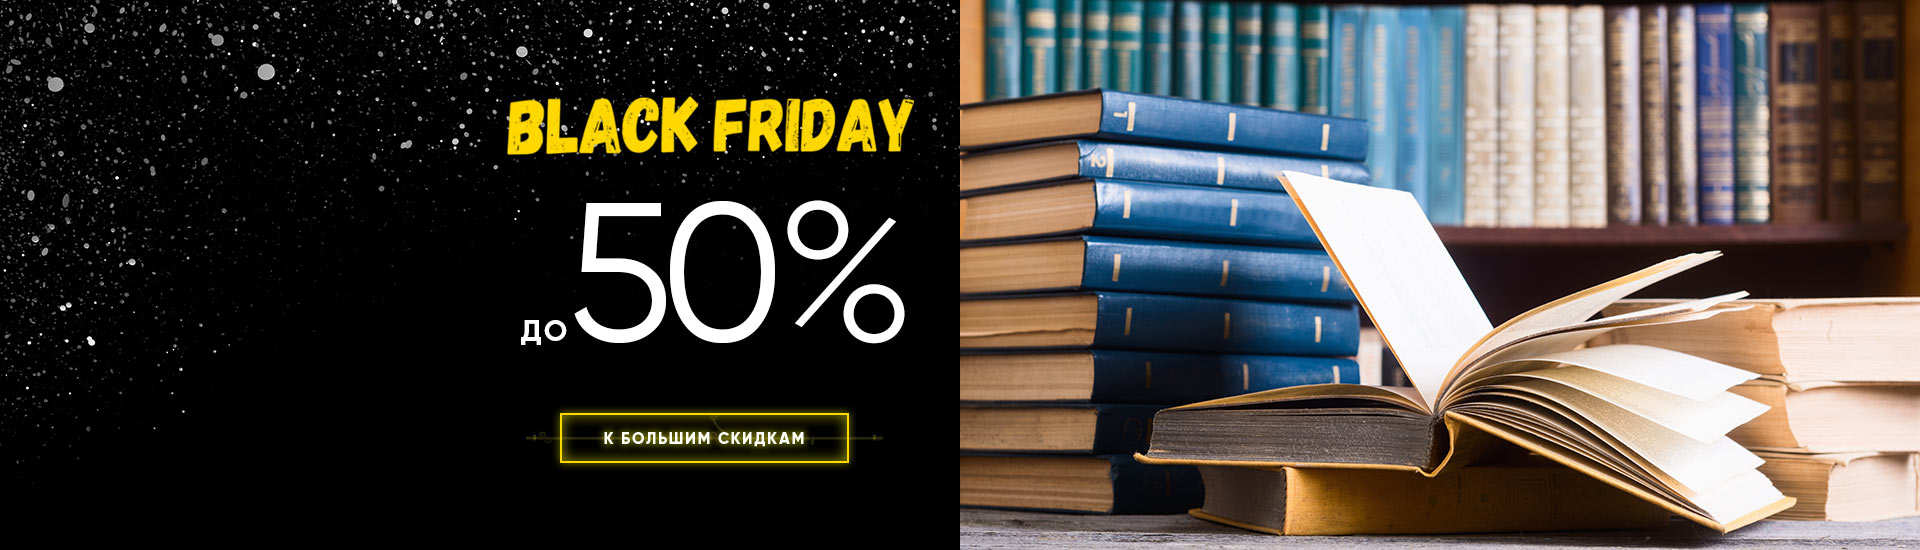 Black Friday: Книги